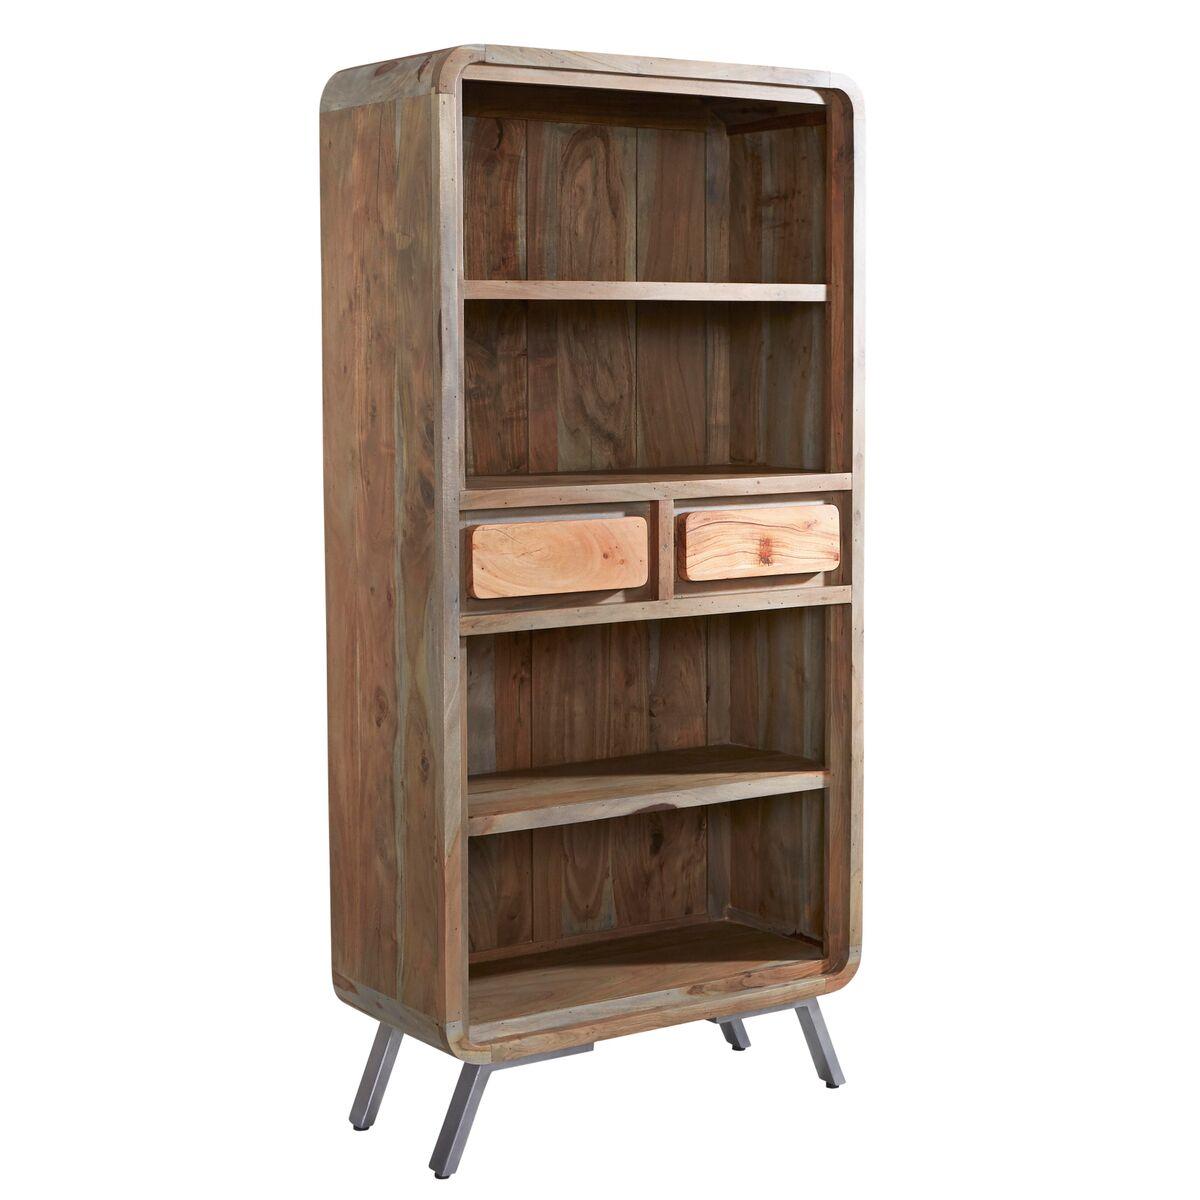 Aspen Iron/Wooden - Large Bookcase